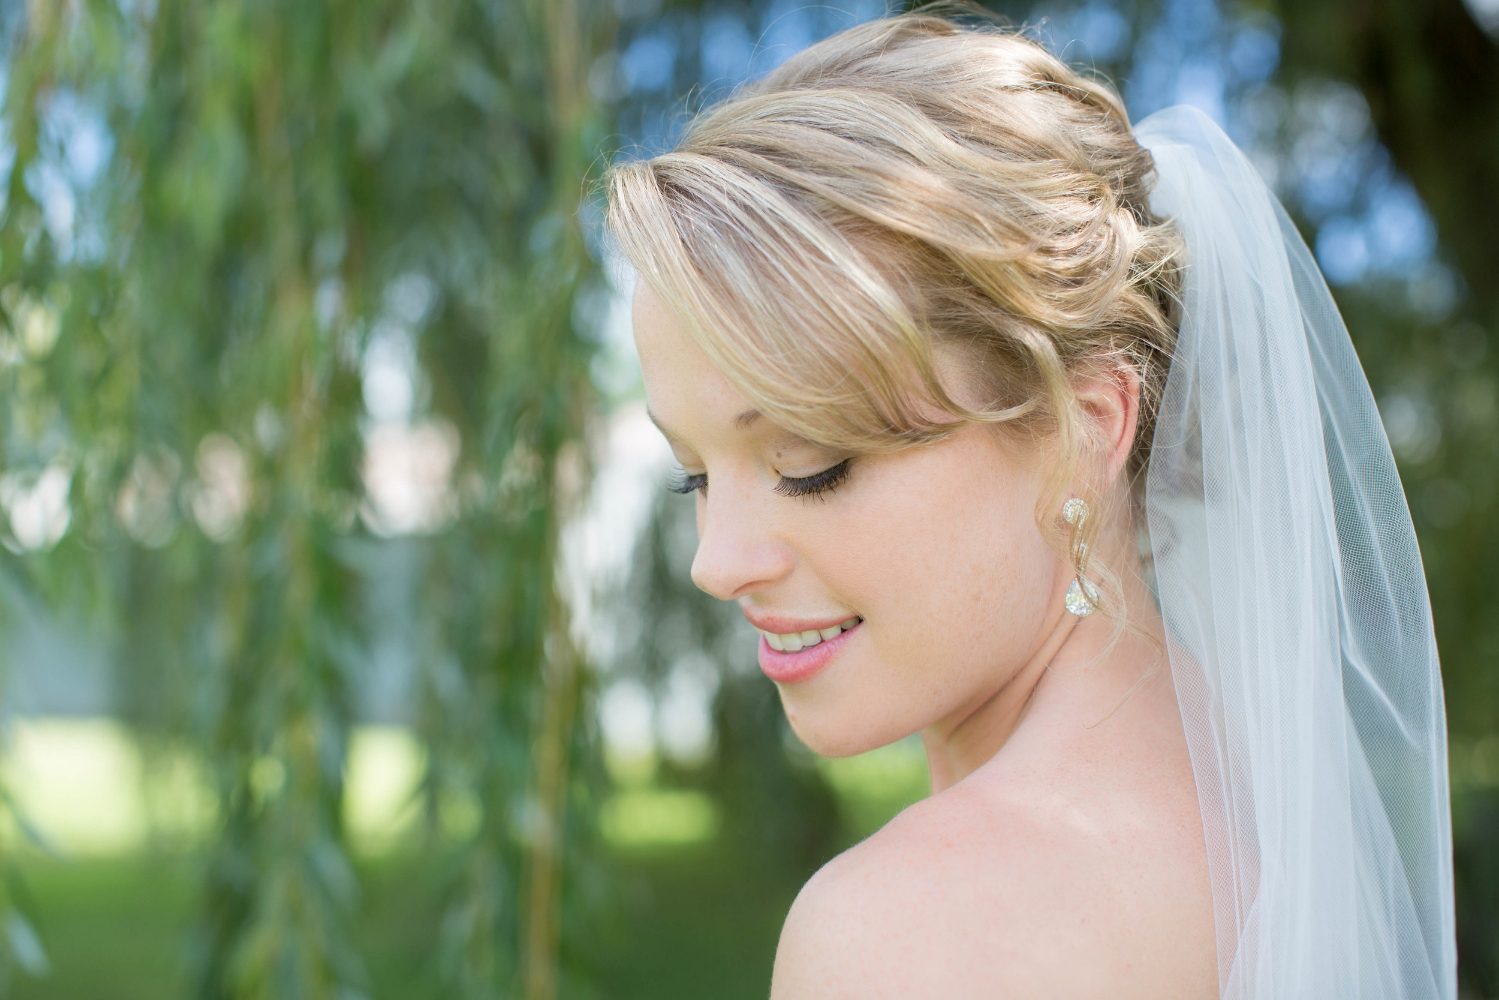 #mnwedding #mnphotographer #countrycharm #brideandgroom #makeup #hair #weddingdetails